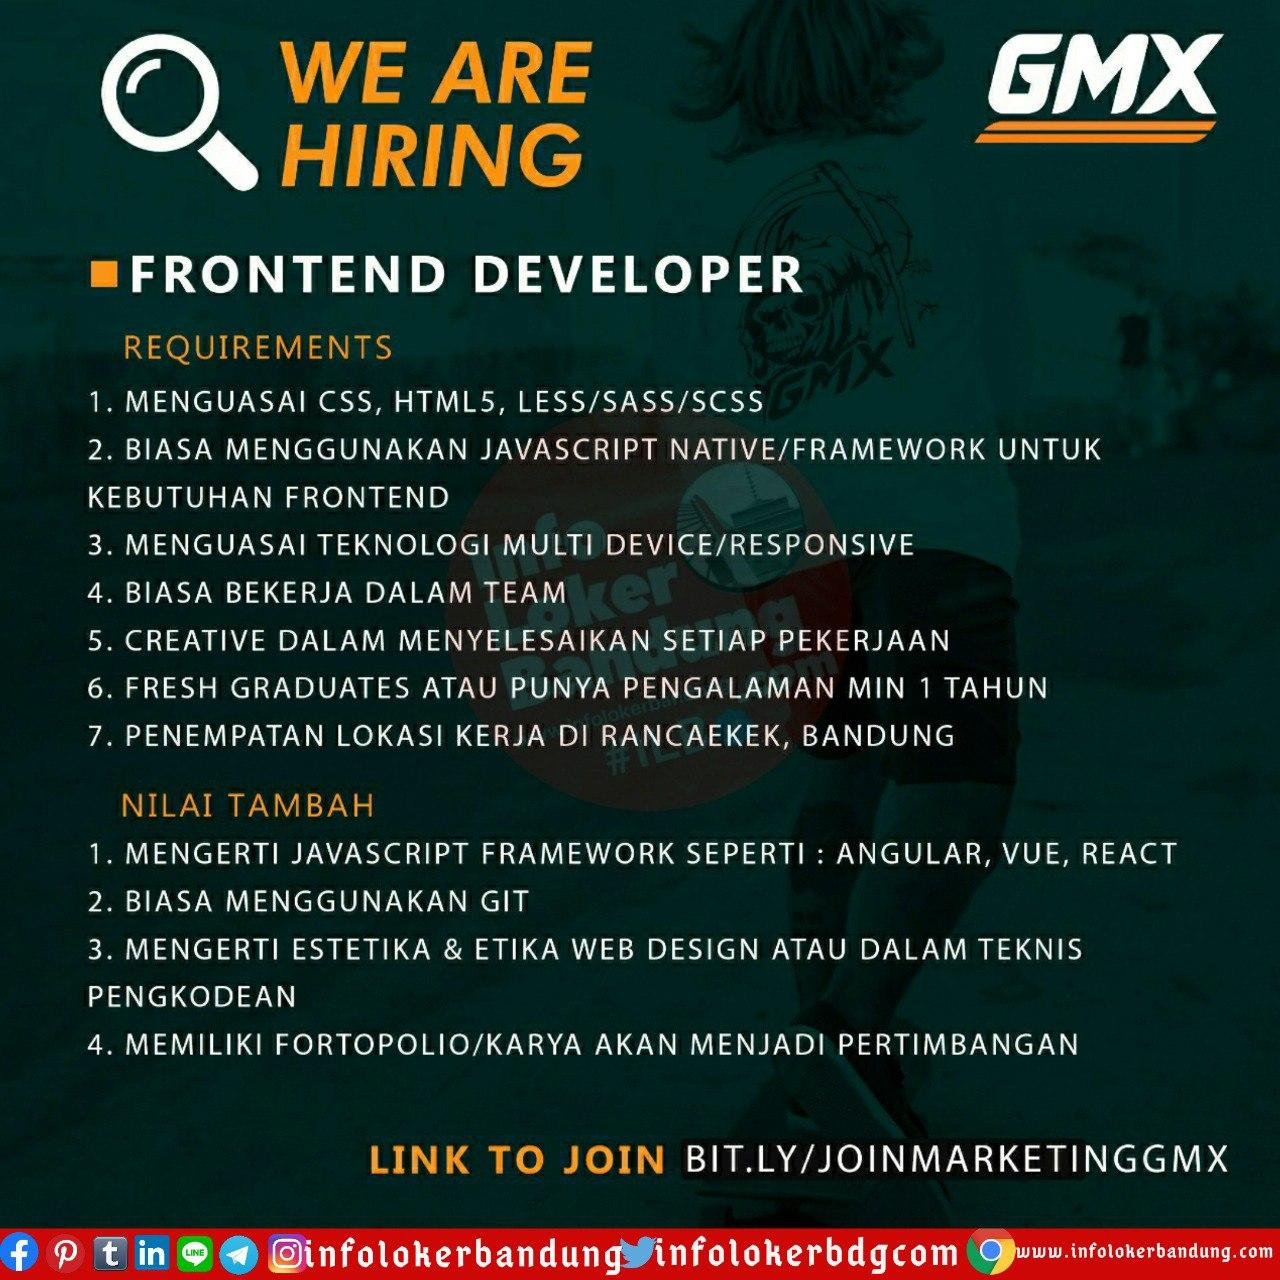 Lowongan Kerja Fronted Developer Gmx Bandung Juli 2020